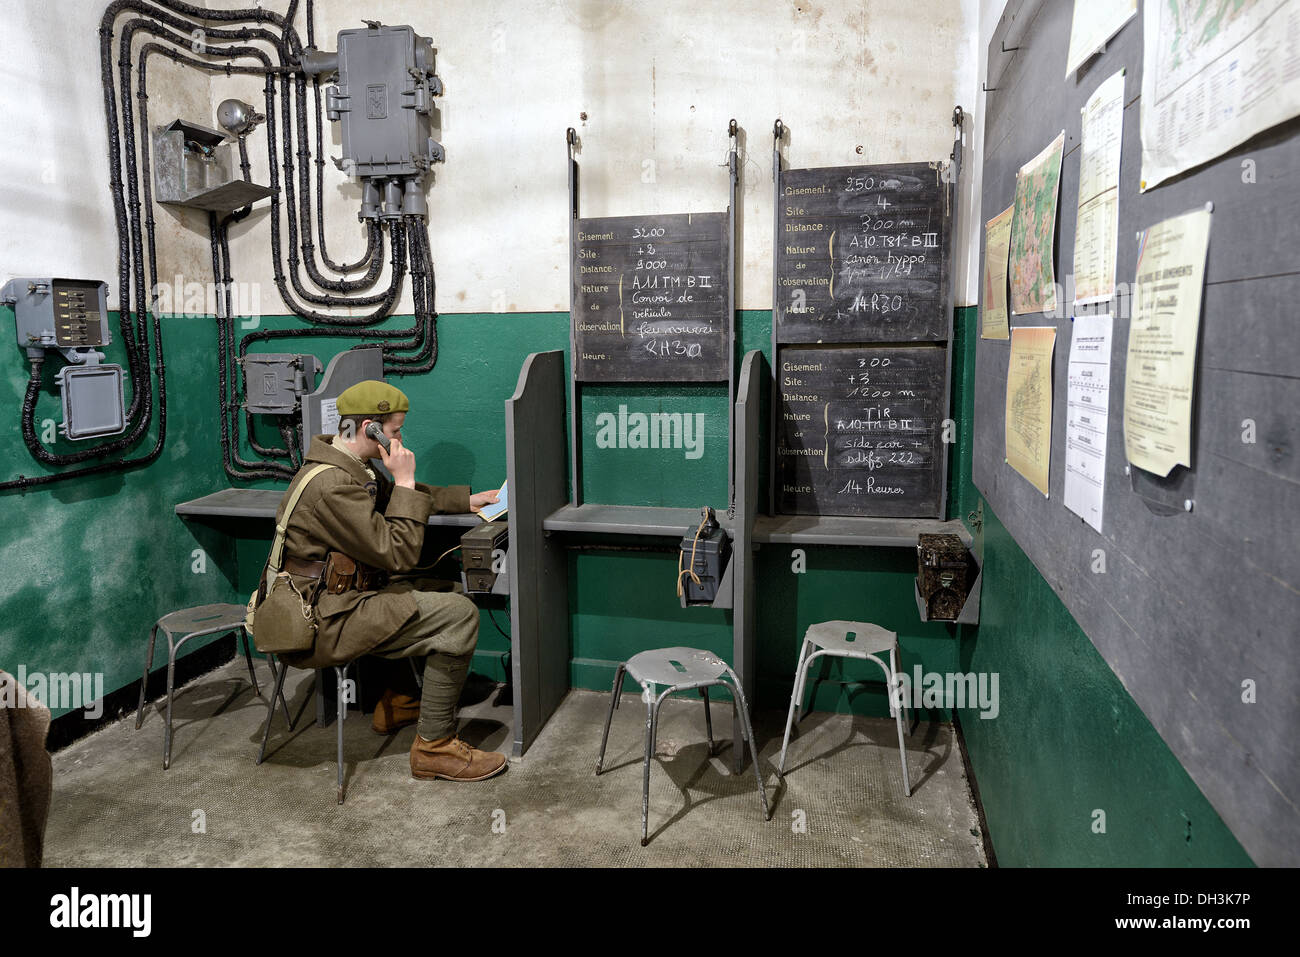 Shooting command post, Immerhof work, Maginot line. - Stock Image